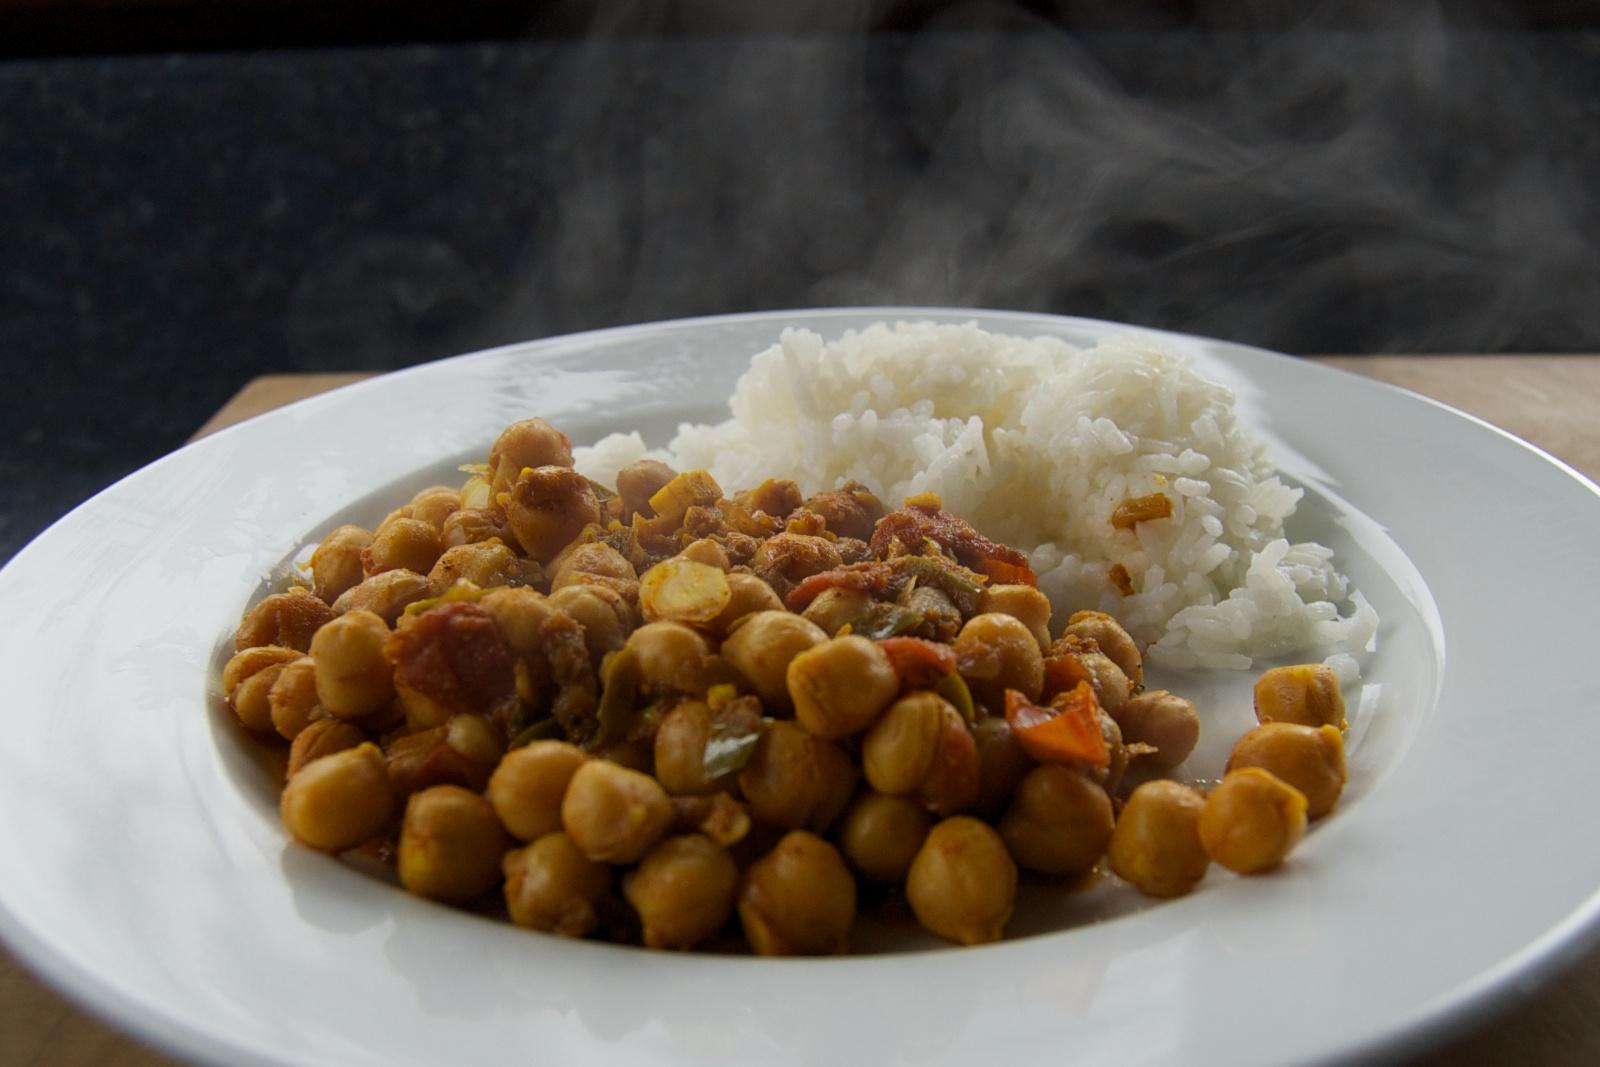 http://blog.rickk.com/food/2012/11/27/ate.2012.11.27.l.jpg